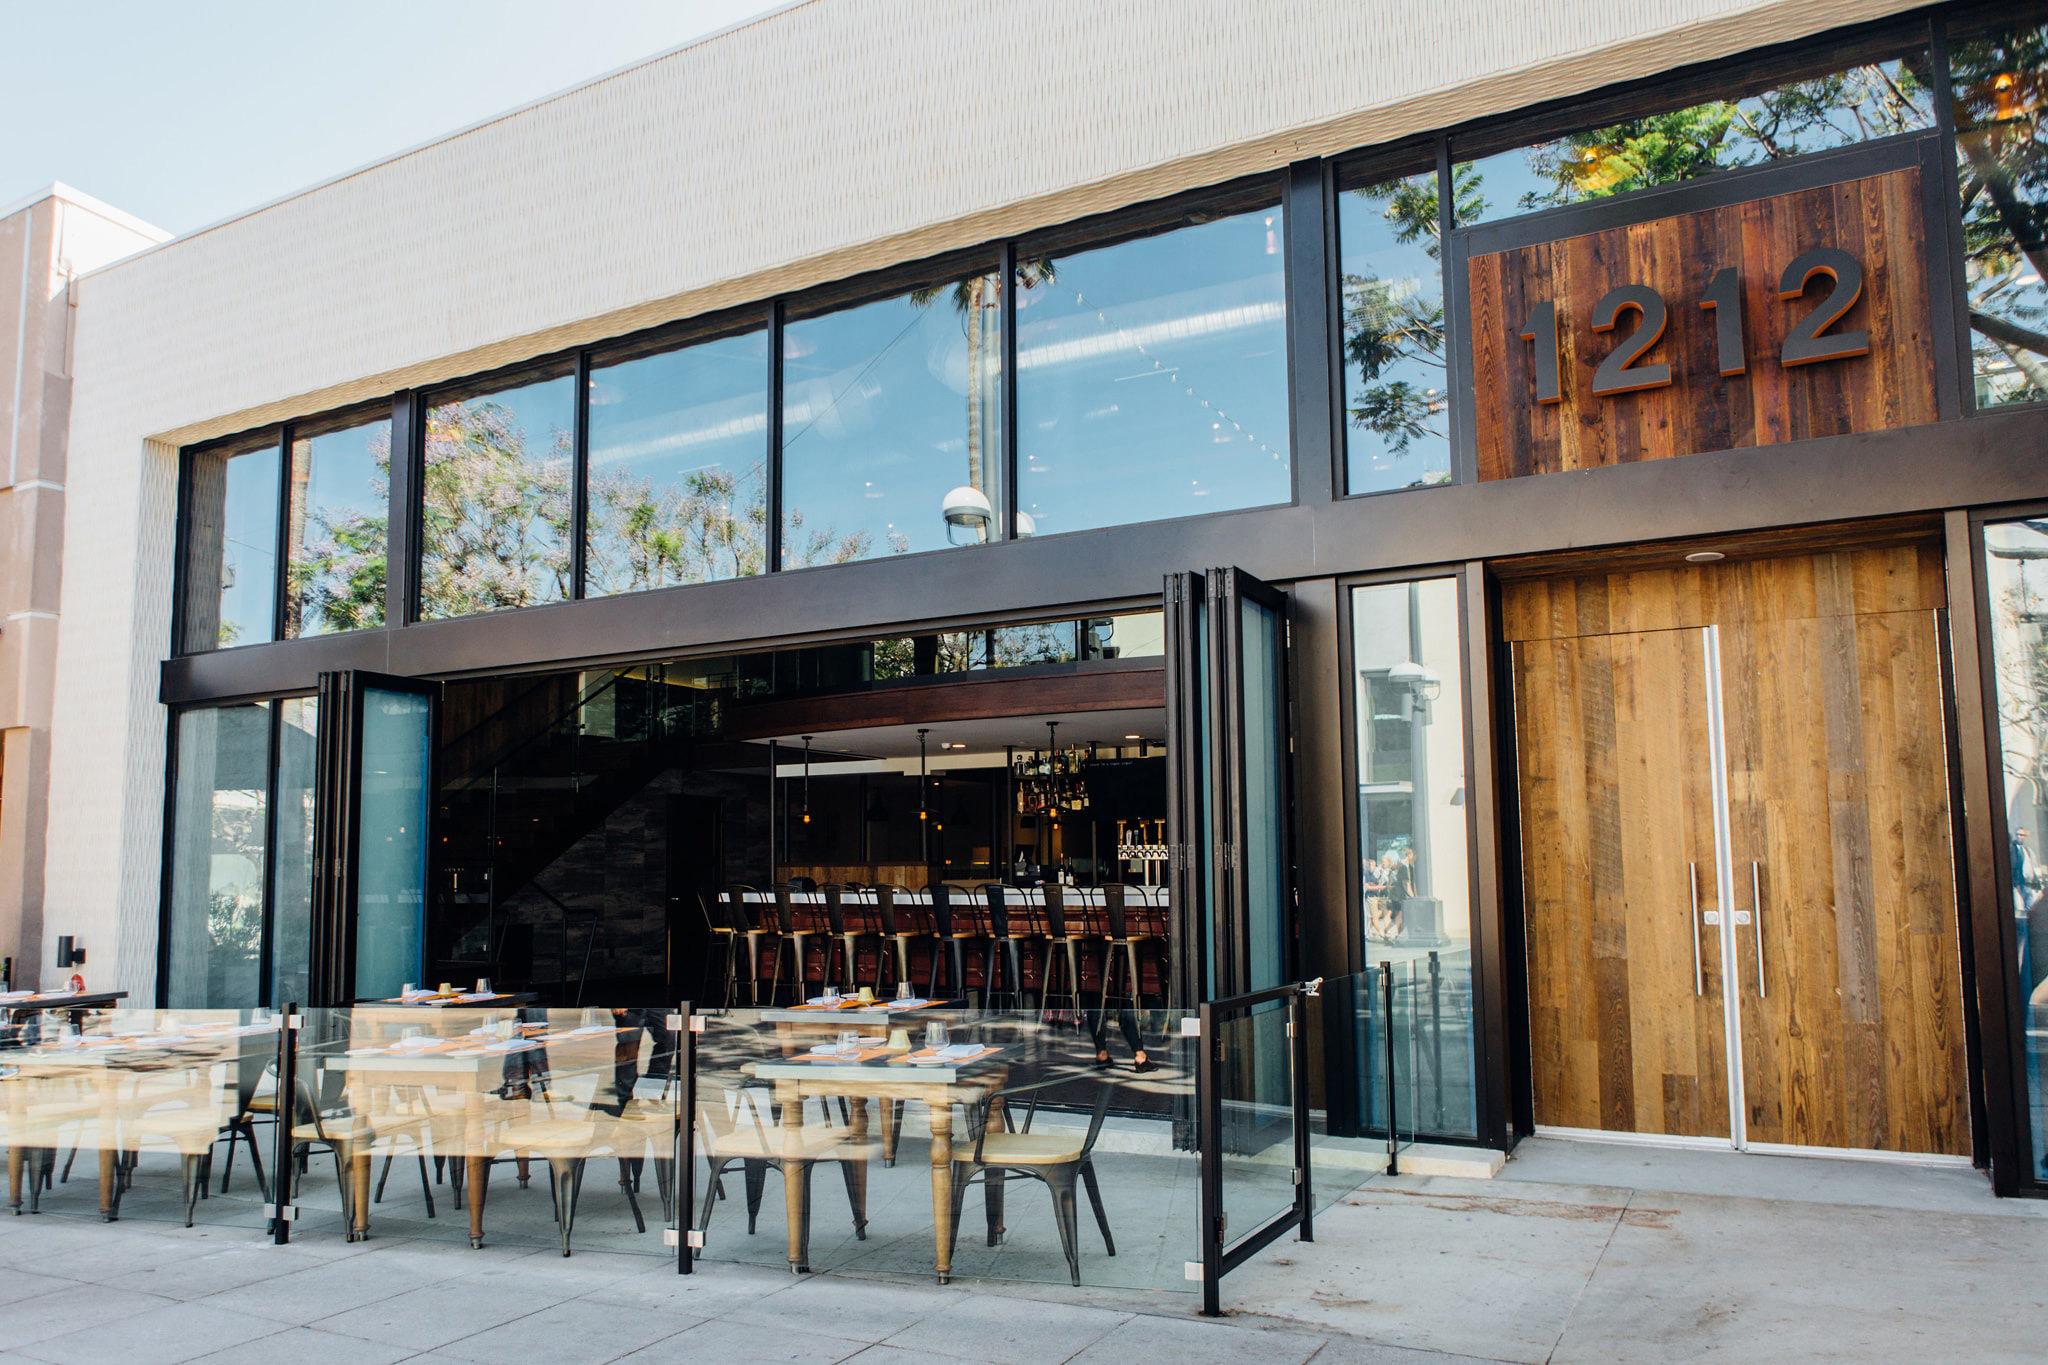 1212 | Restaurants in Santa Monica, Santa Monica